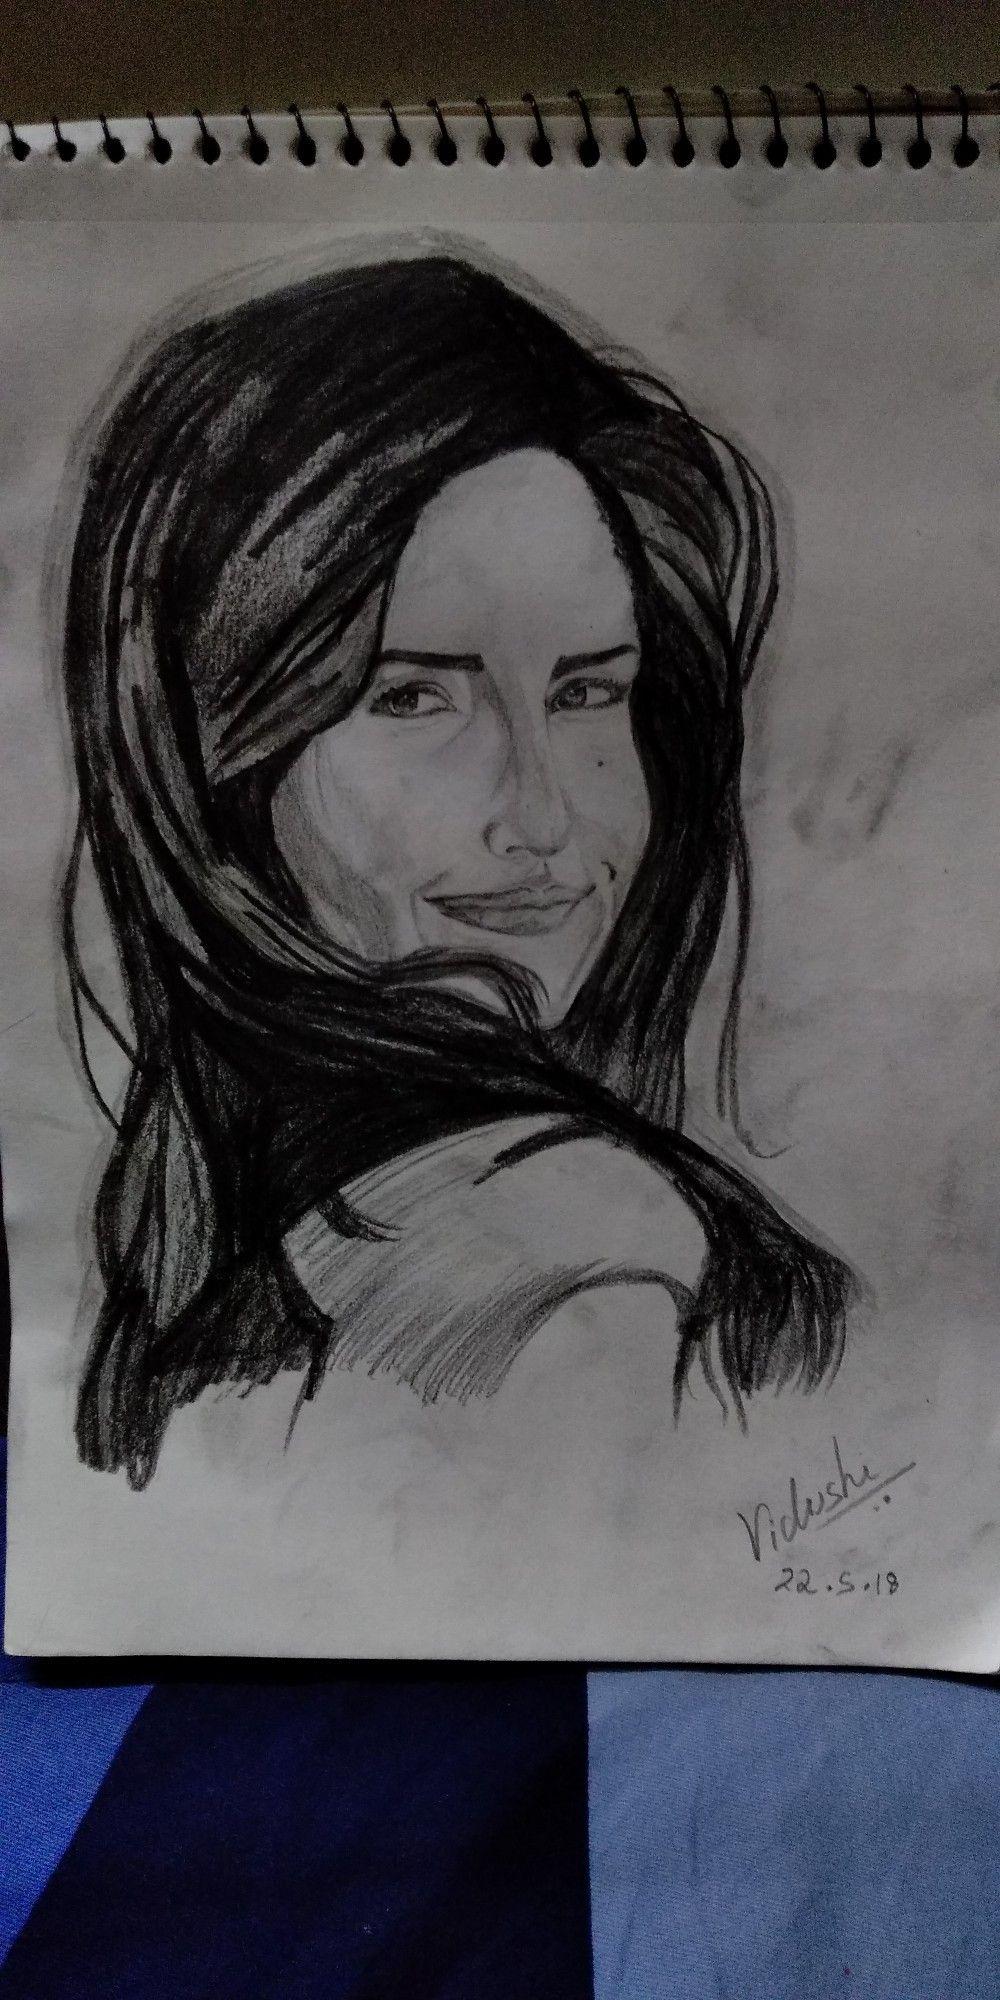 Katrina kaif sketch by sketches by vidushi